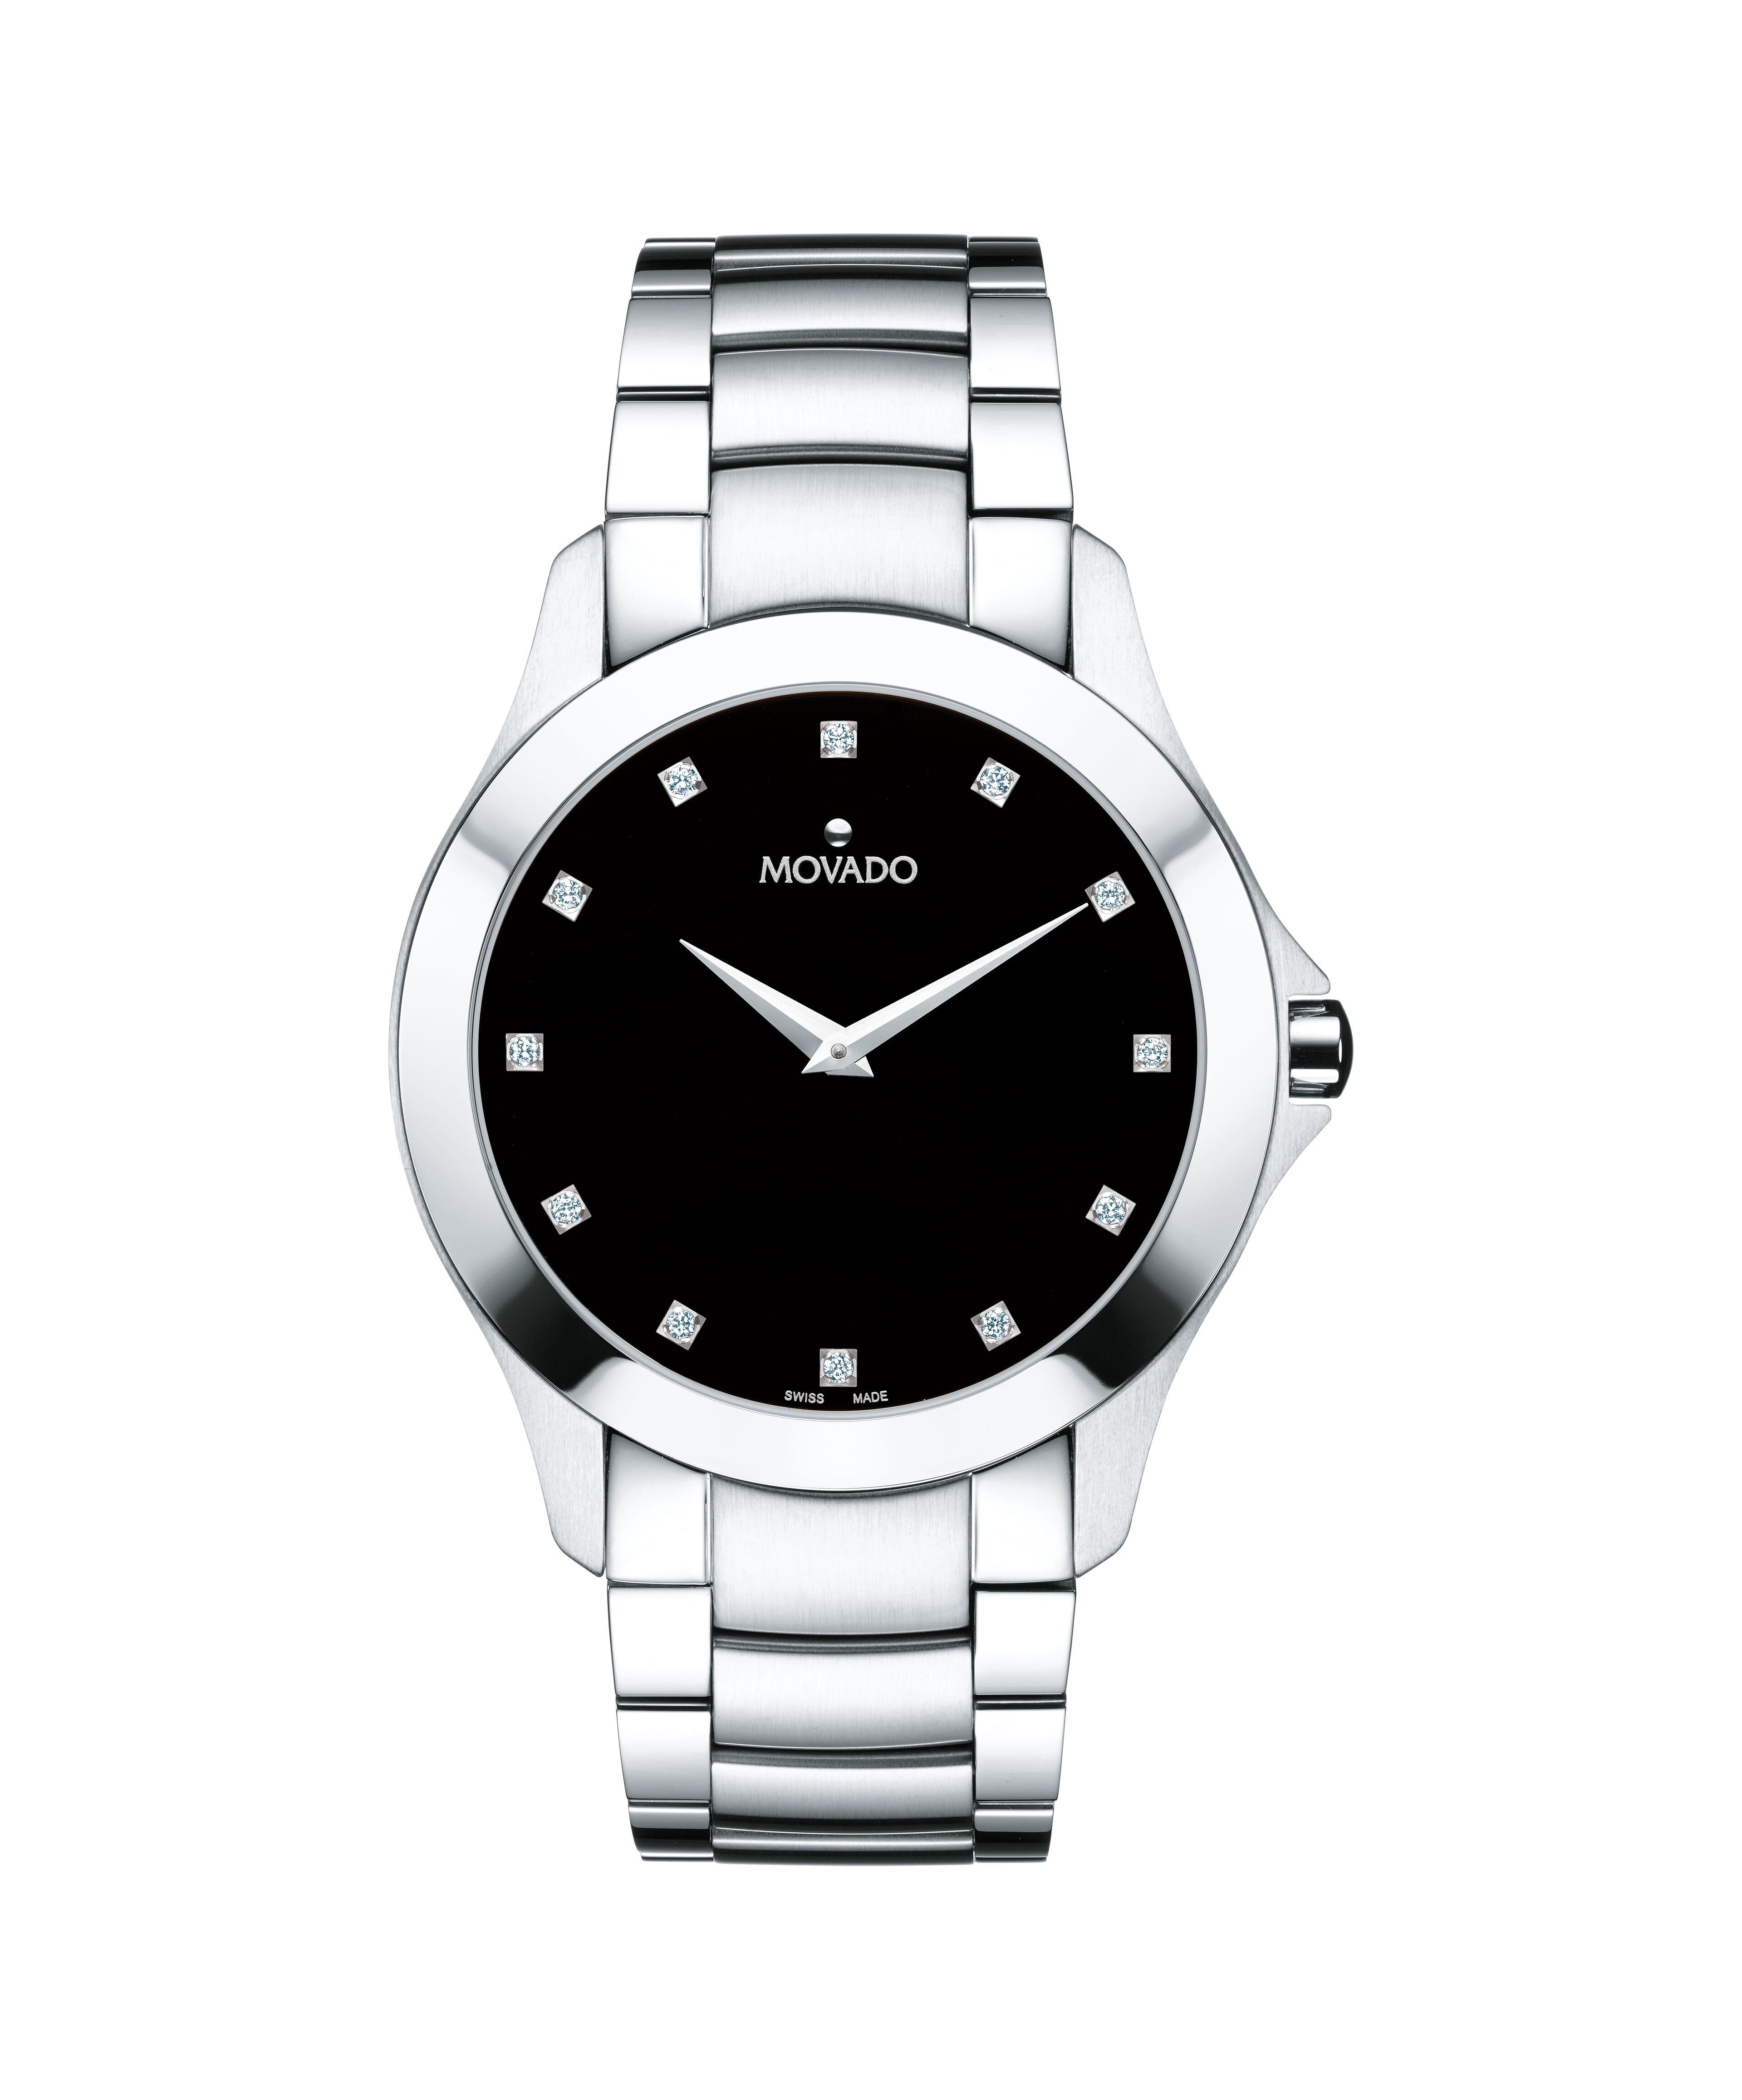 Cartier Watch Men Replica